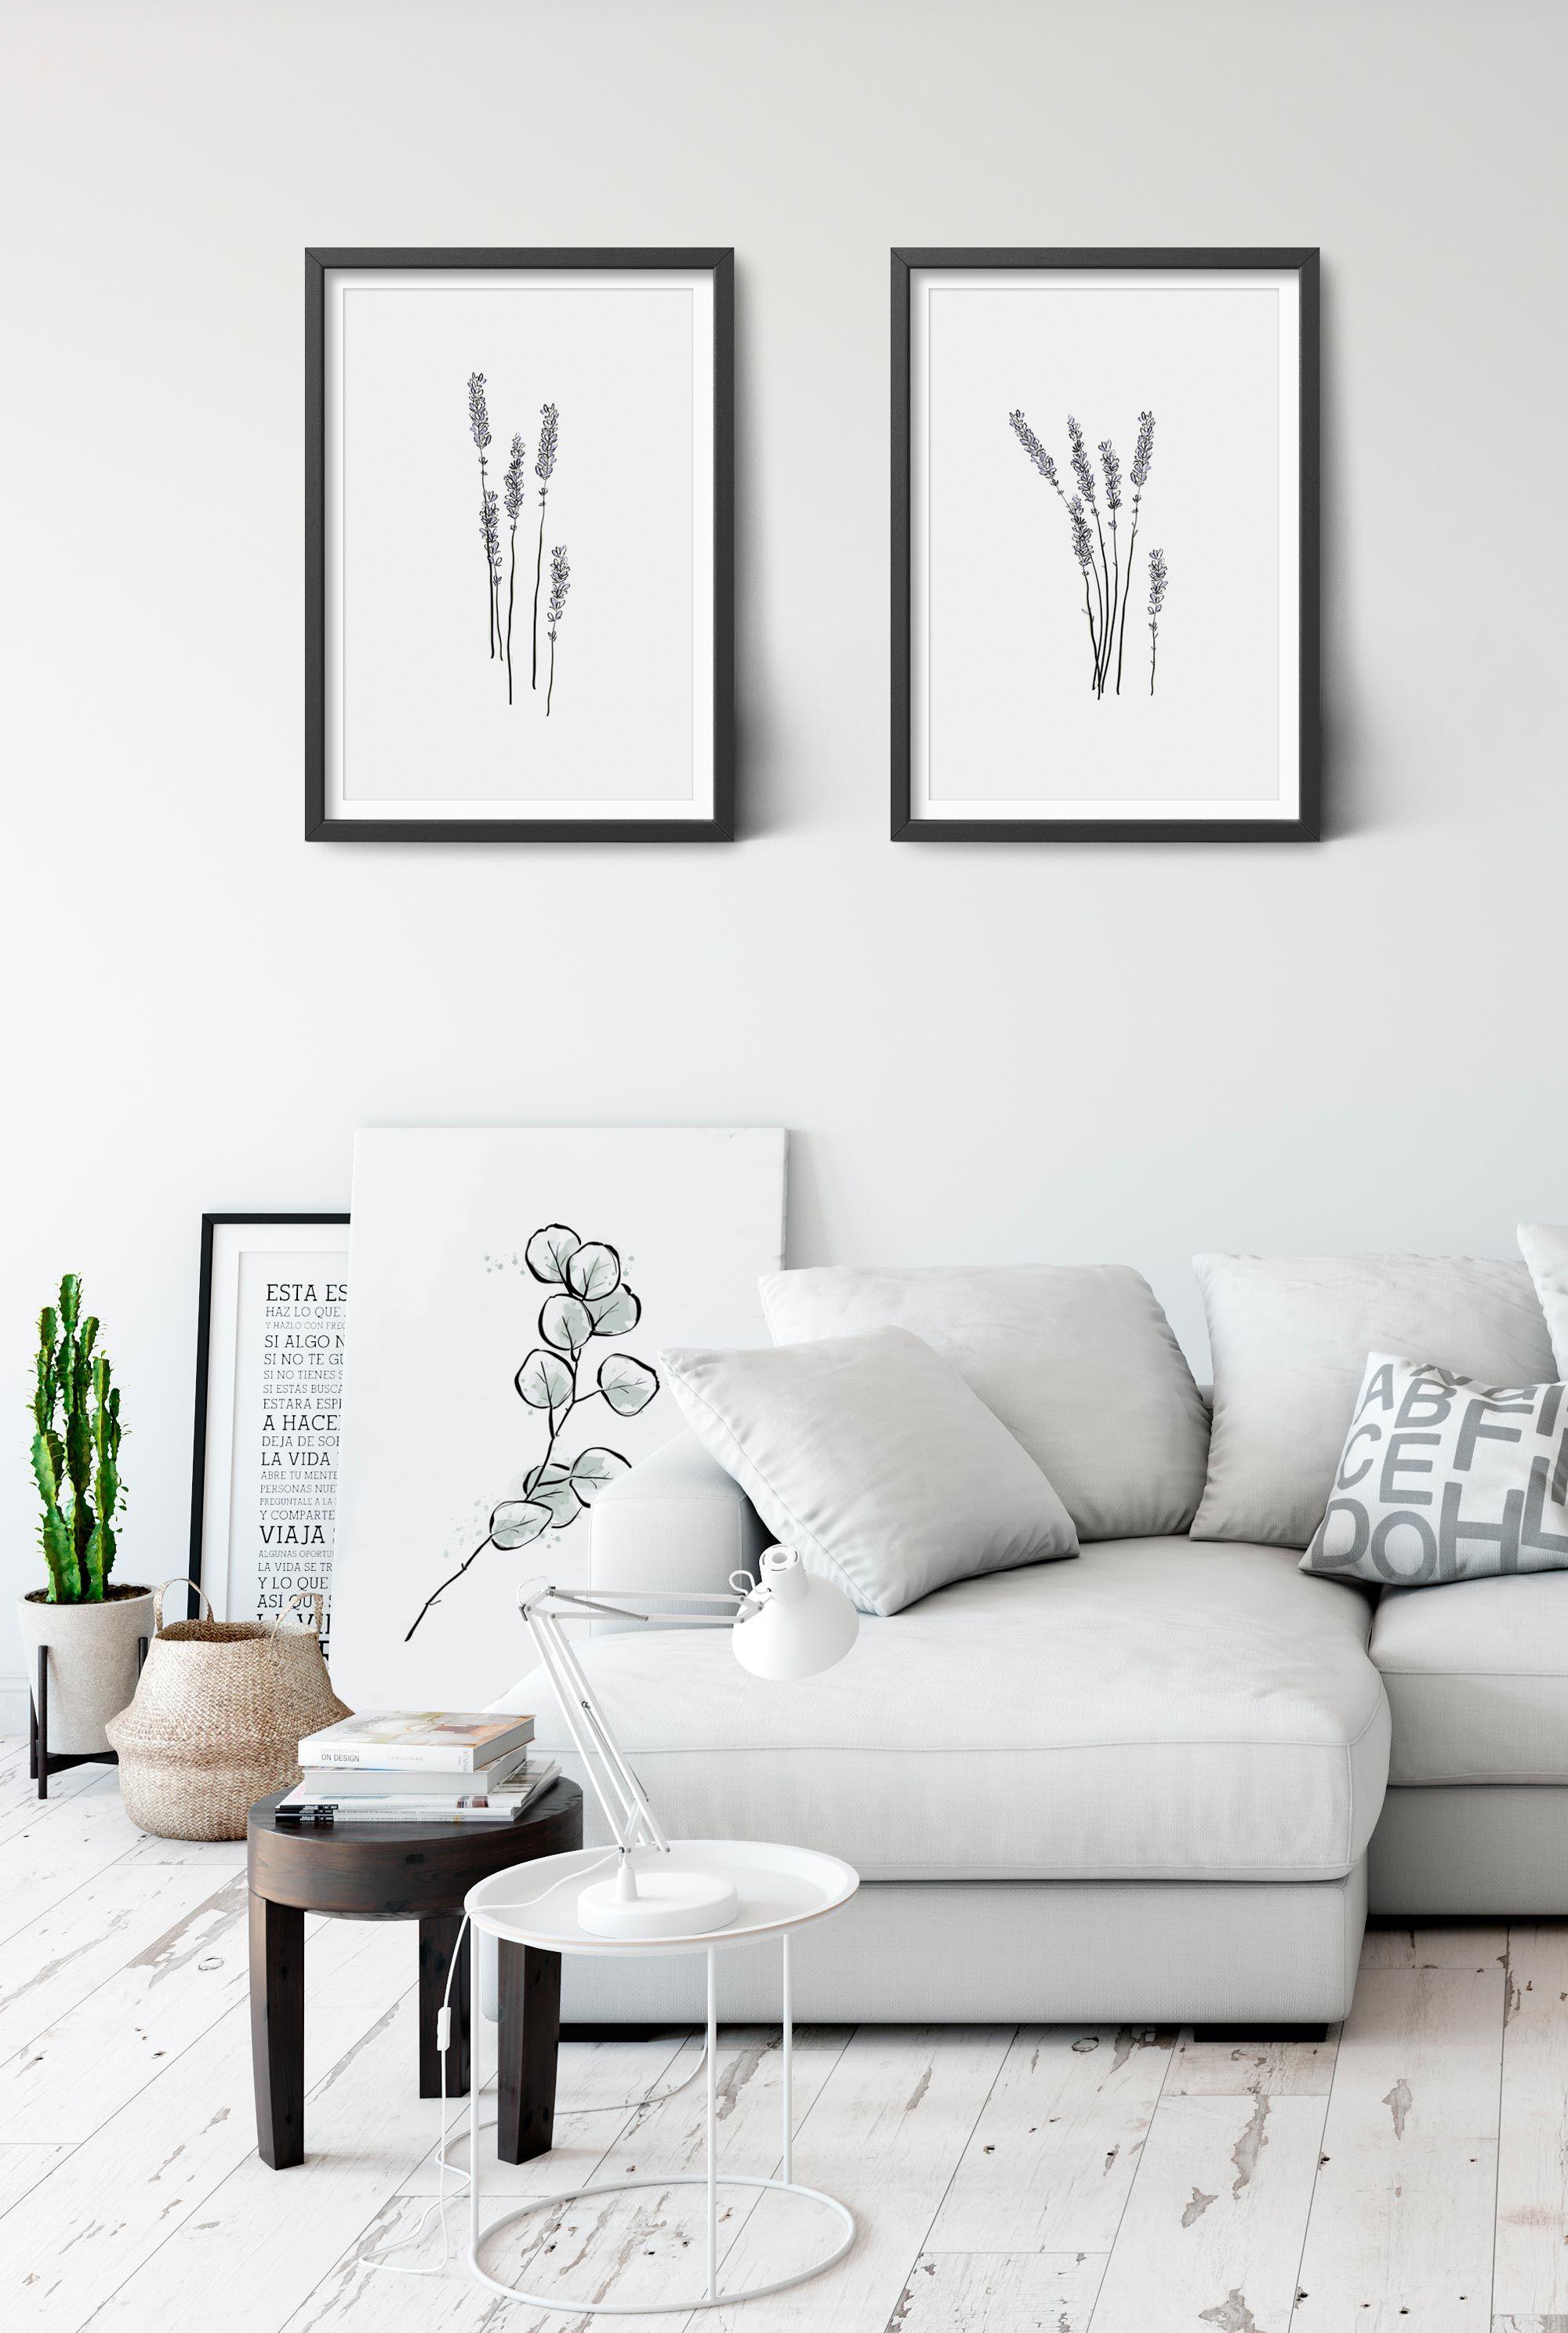 Lavender Printable Wall Art Modern And Contemporary Living Room Decor Pine Trees Studio Decoracion De Unas Sala #wall #art #contemporary #living #room